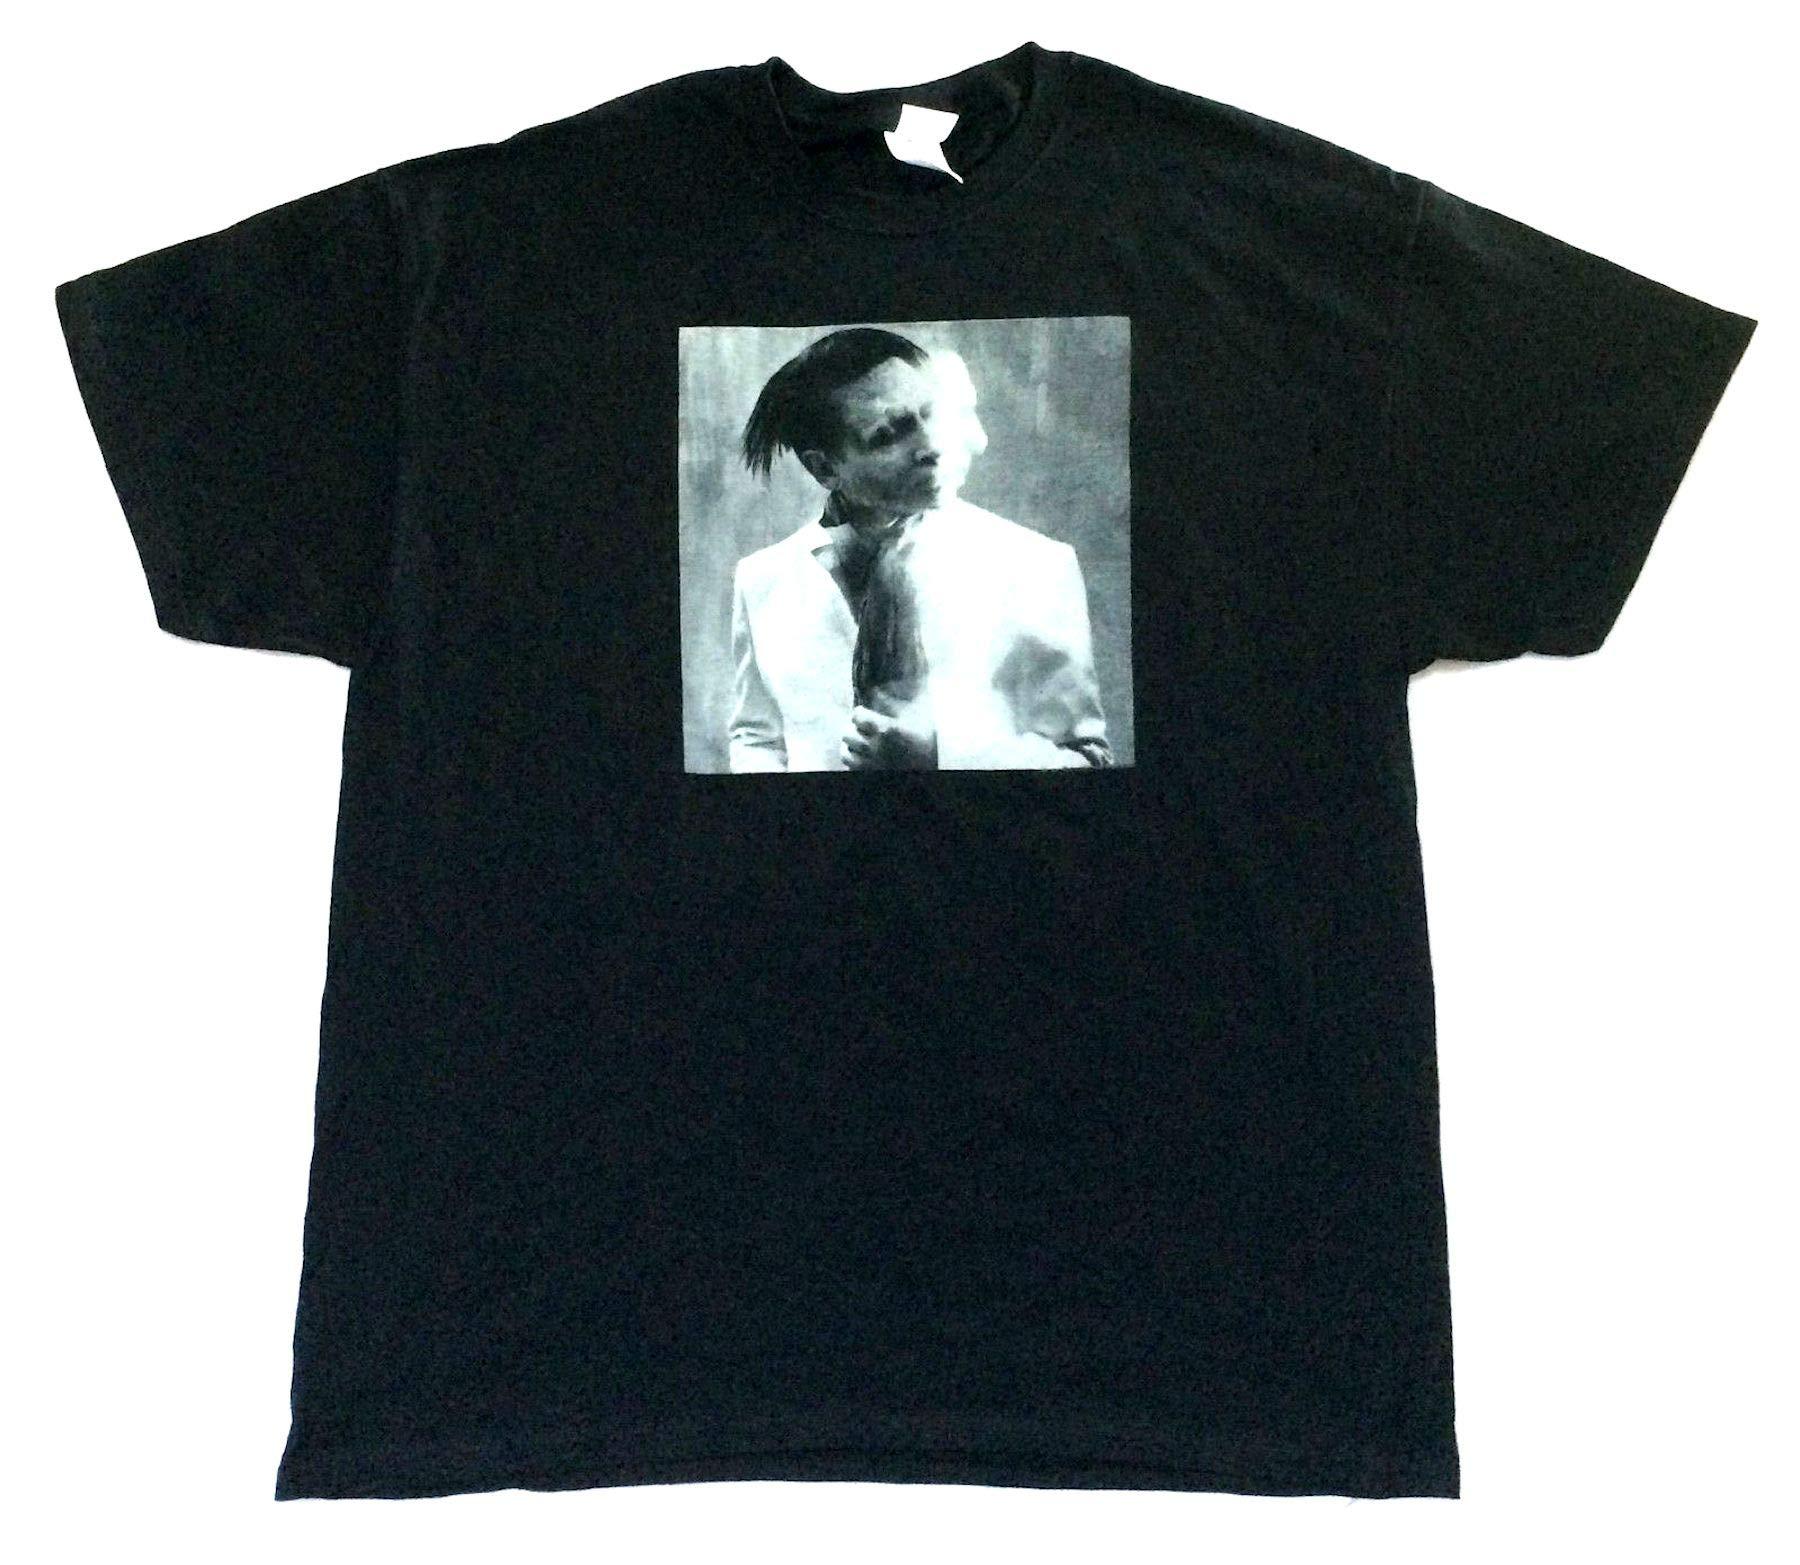 Marilyn Manson Seven Day Binge T Shirt 2195